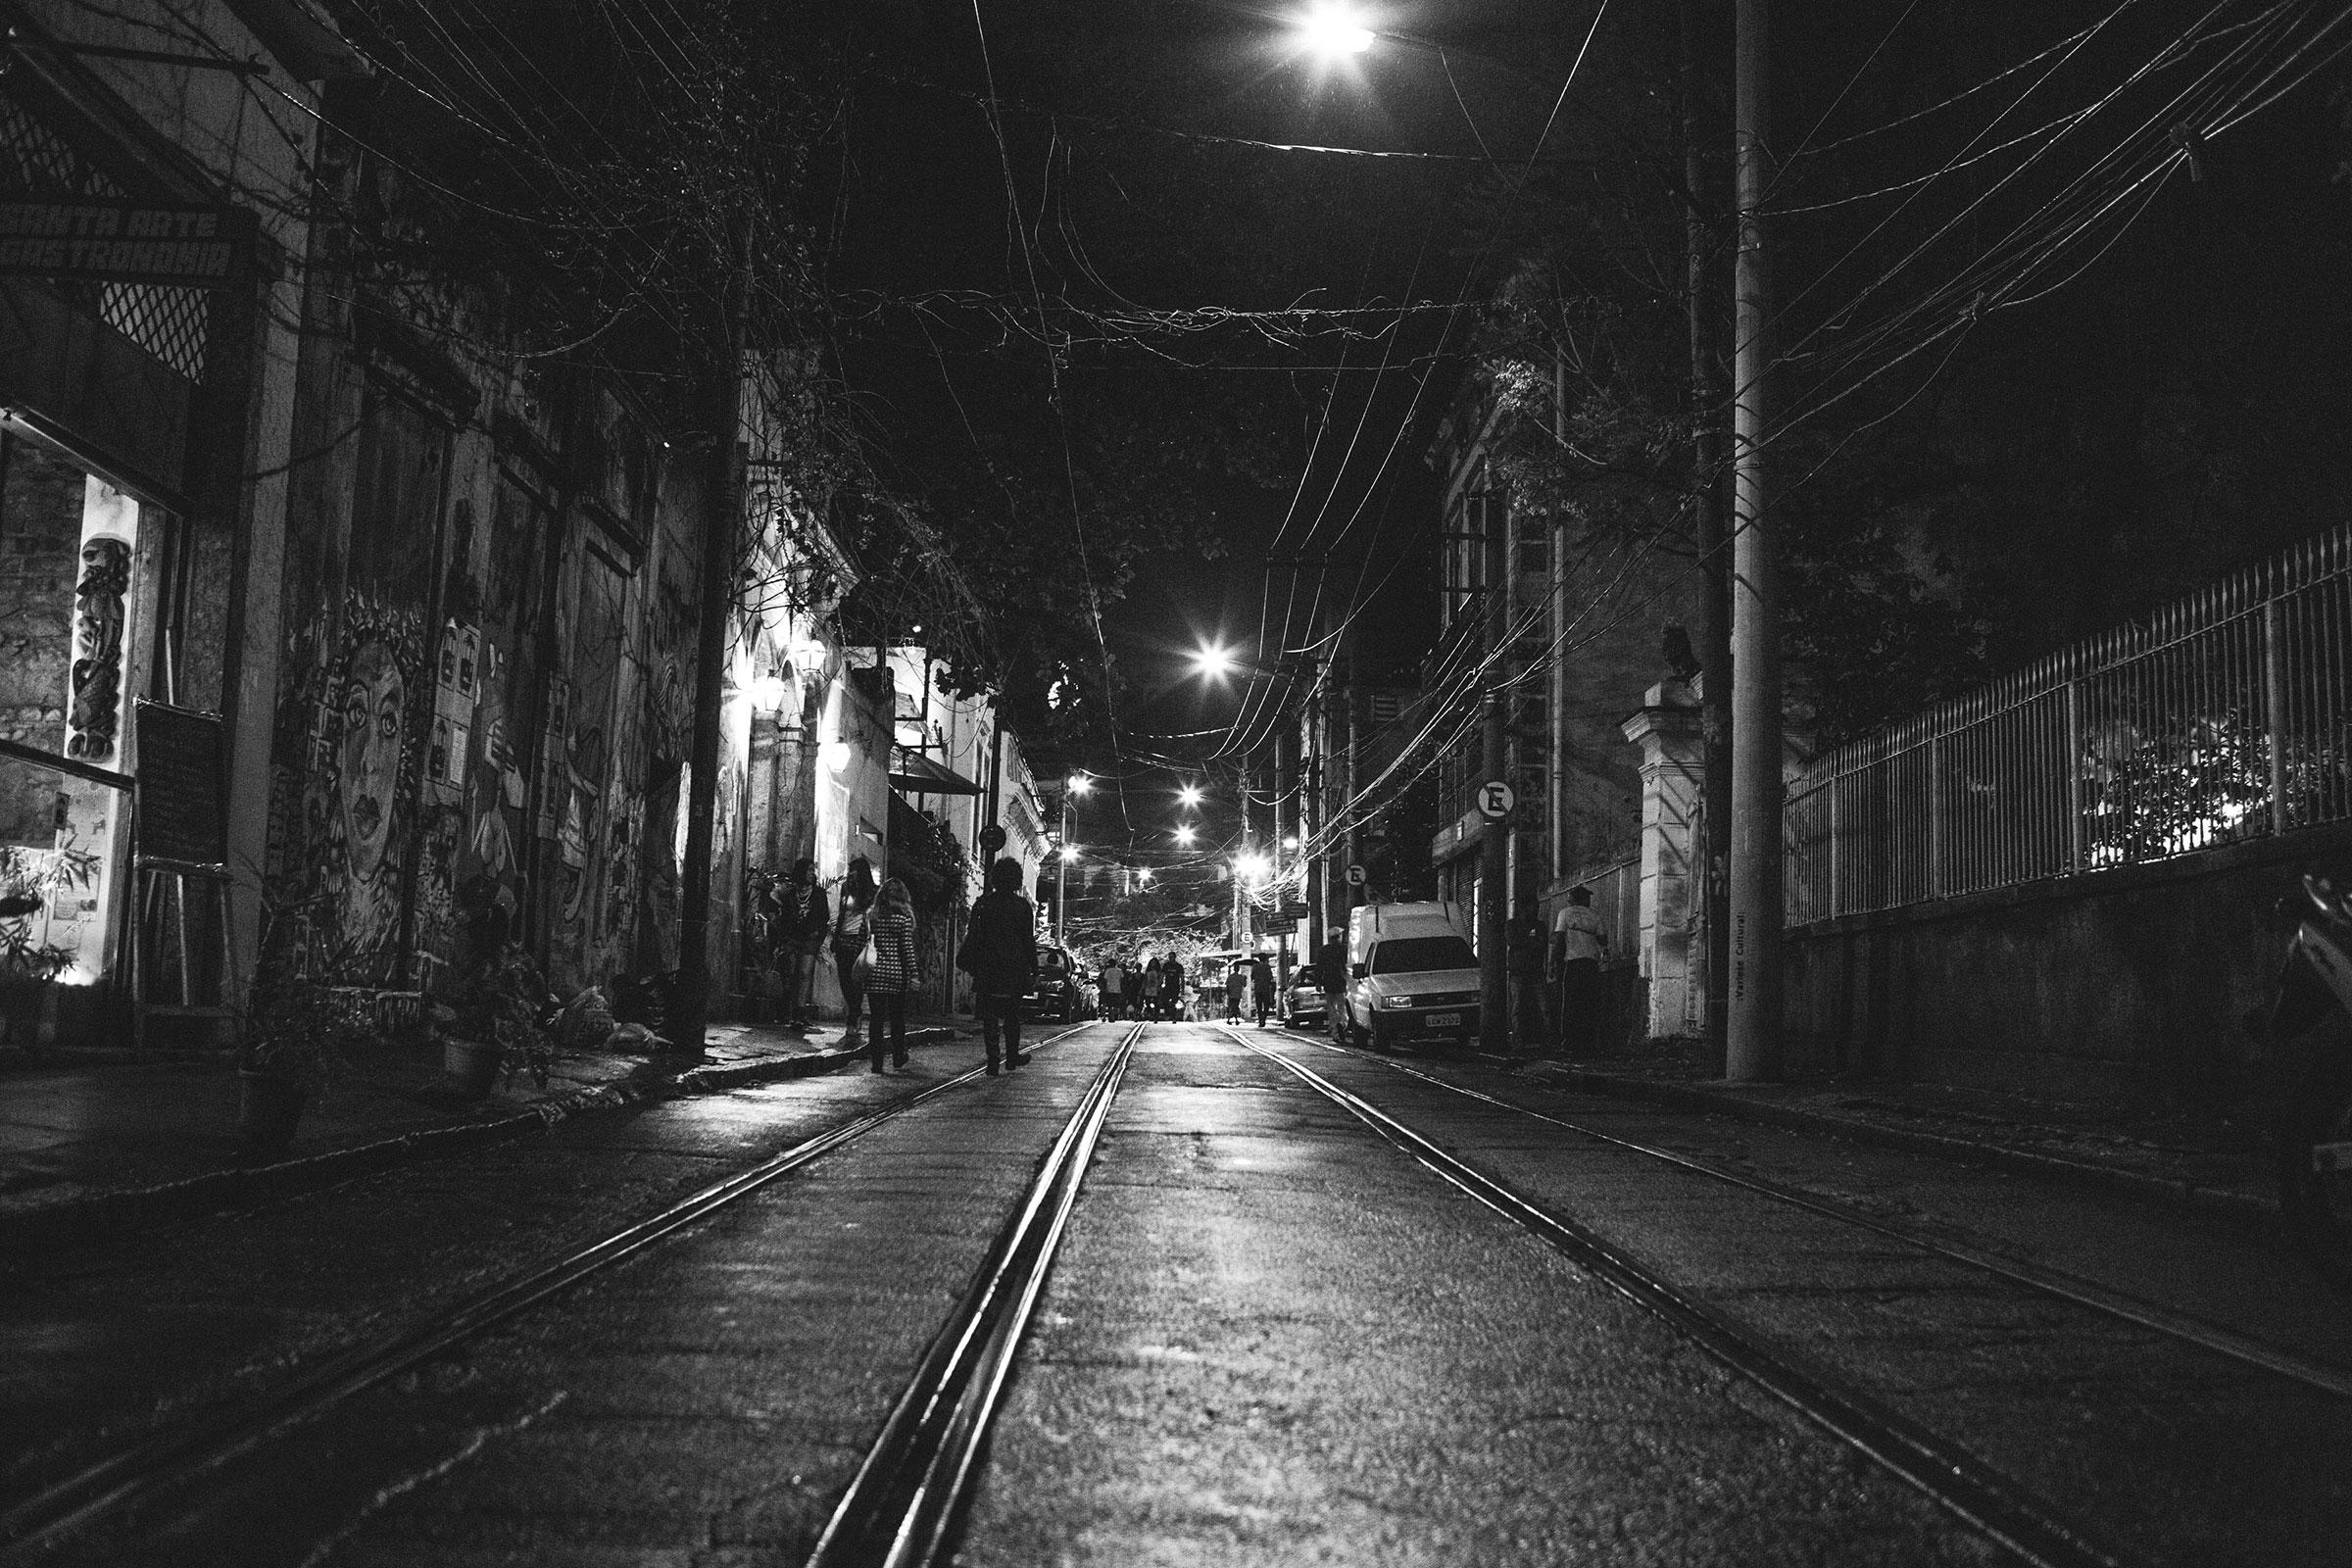 Rio trip:A view of a deserted street with tram tracks and grafitti on the walls, Rio De Janeiro